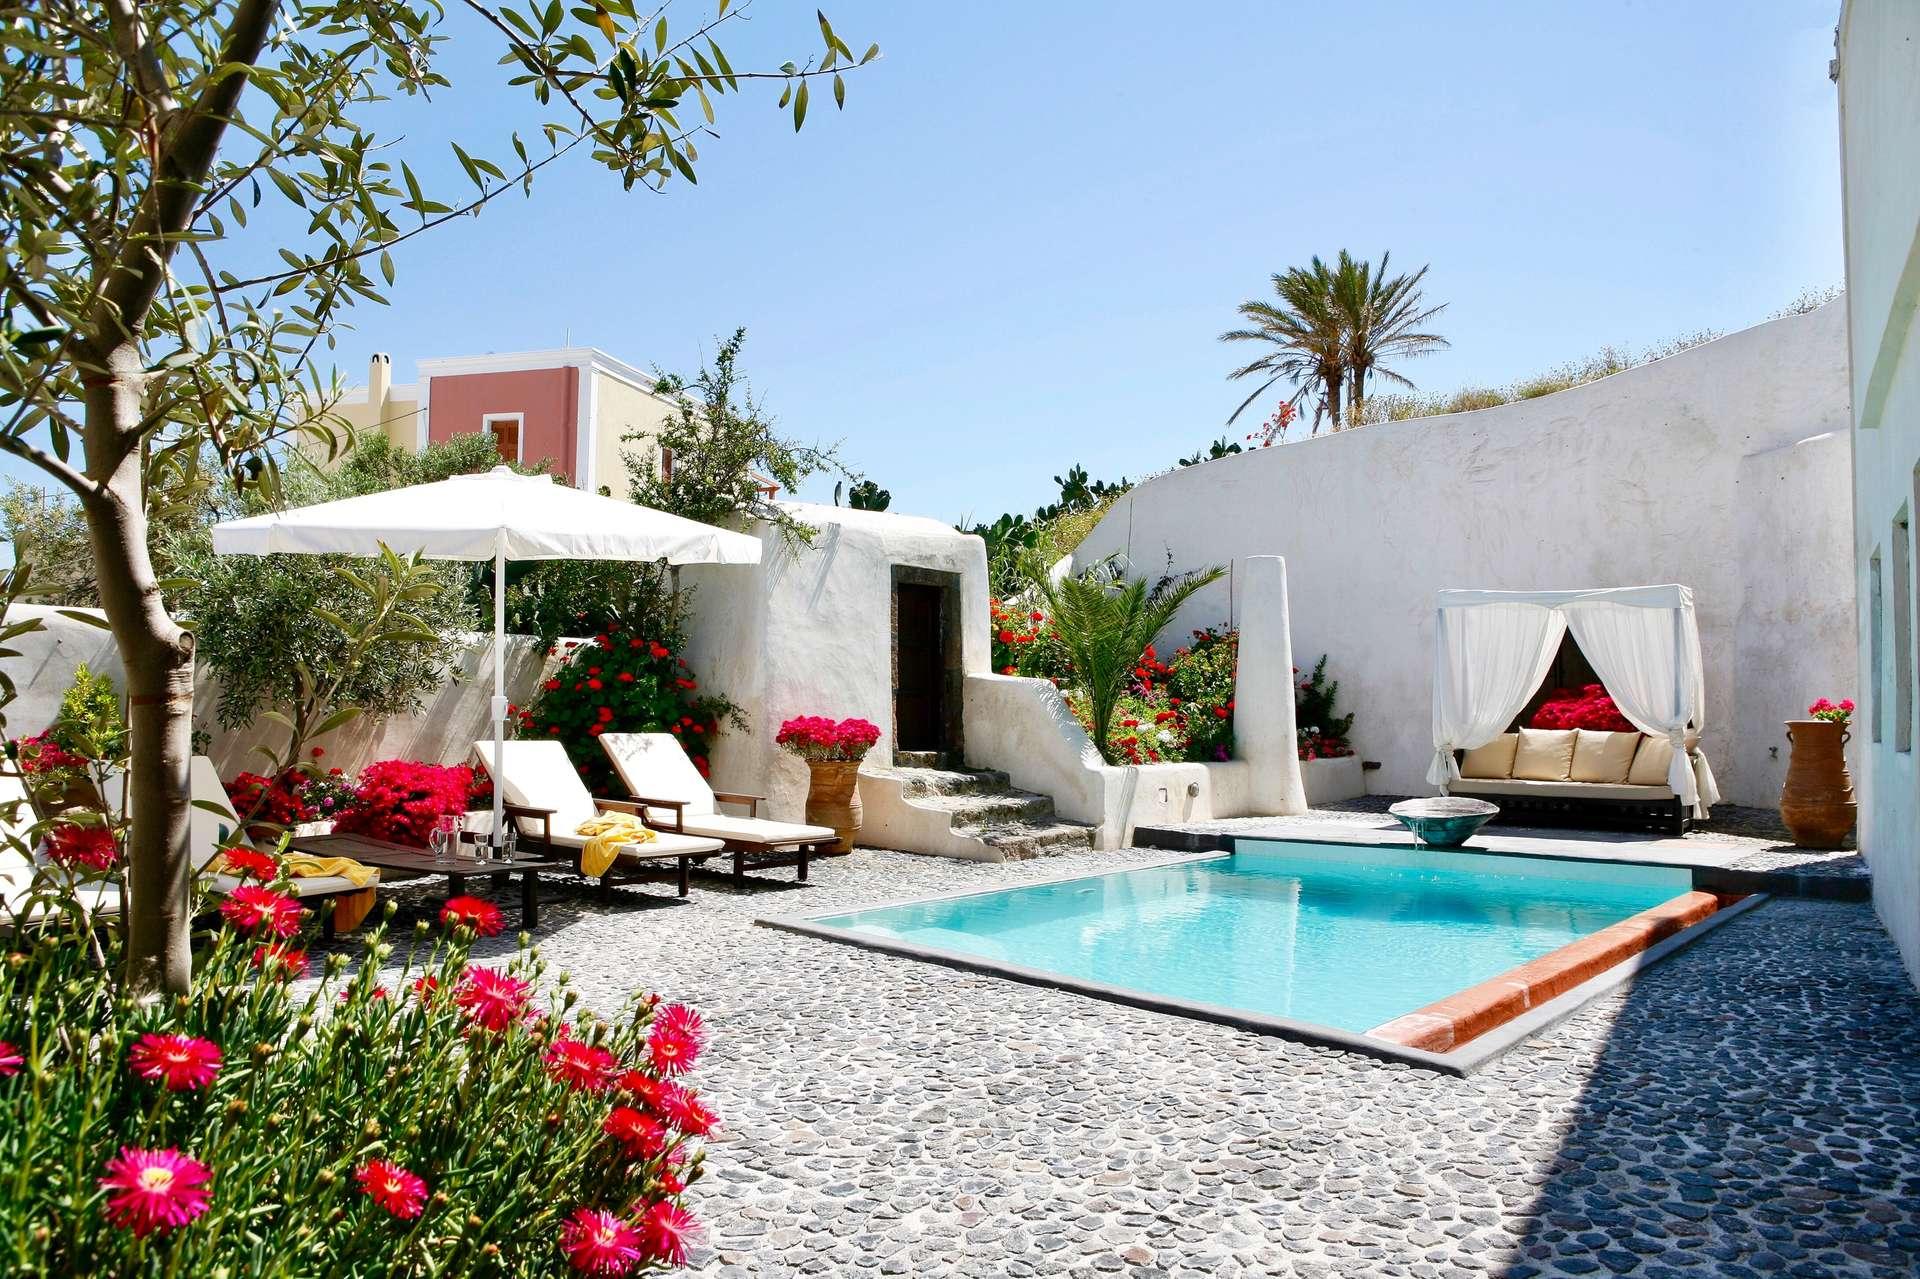 Luxury vacation rentals europe - Greece - Santorini - Megalochori - Sophia Mansion - Image 1/13